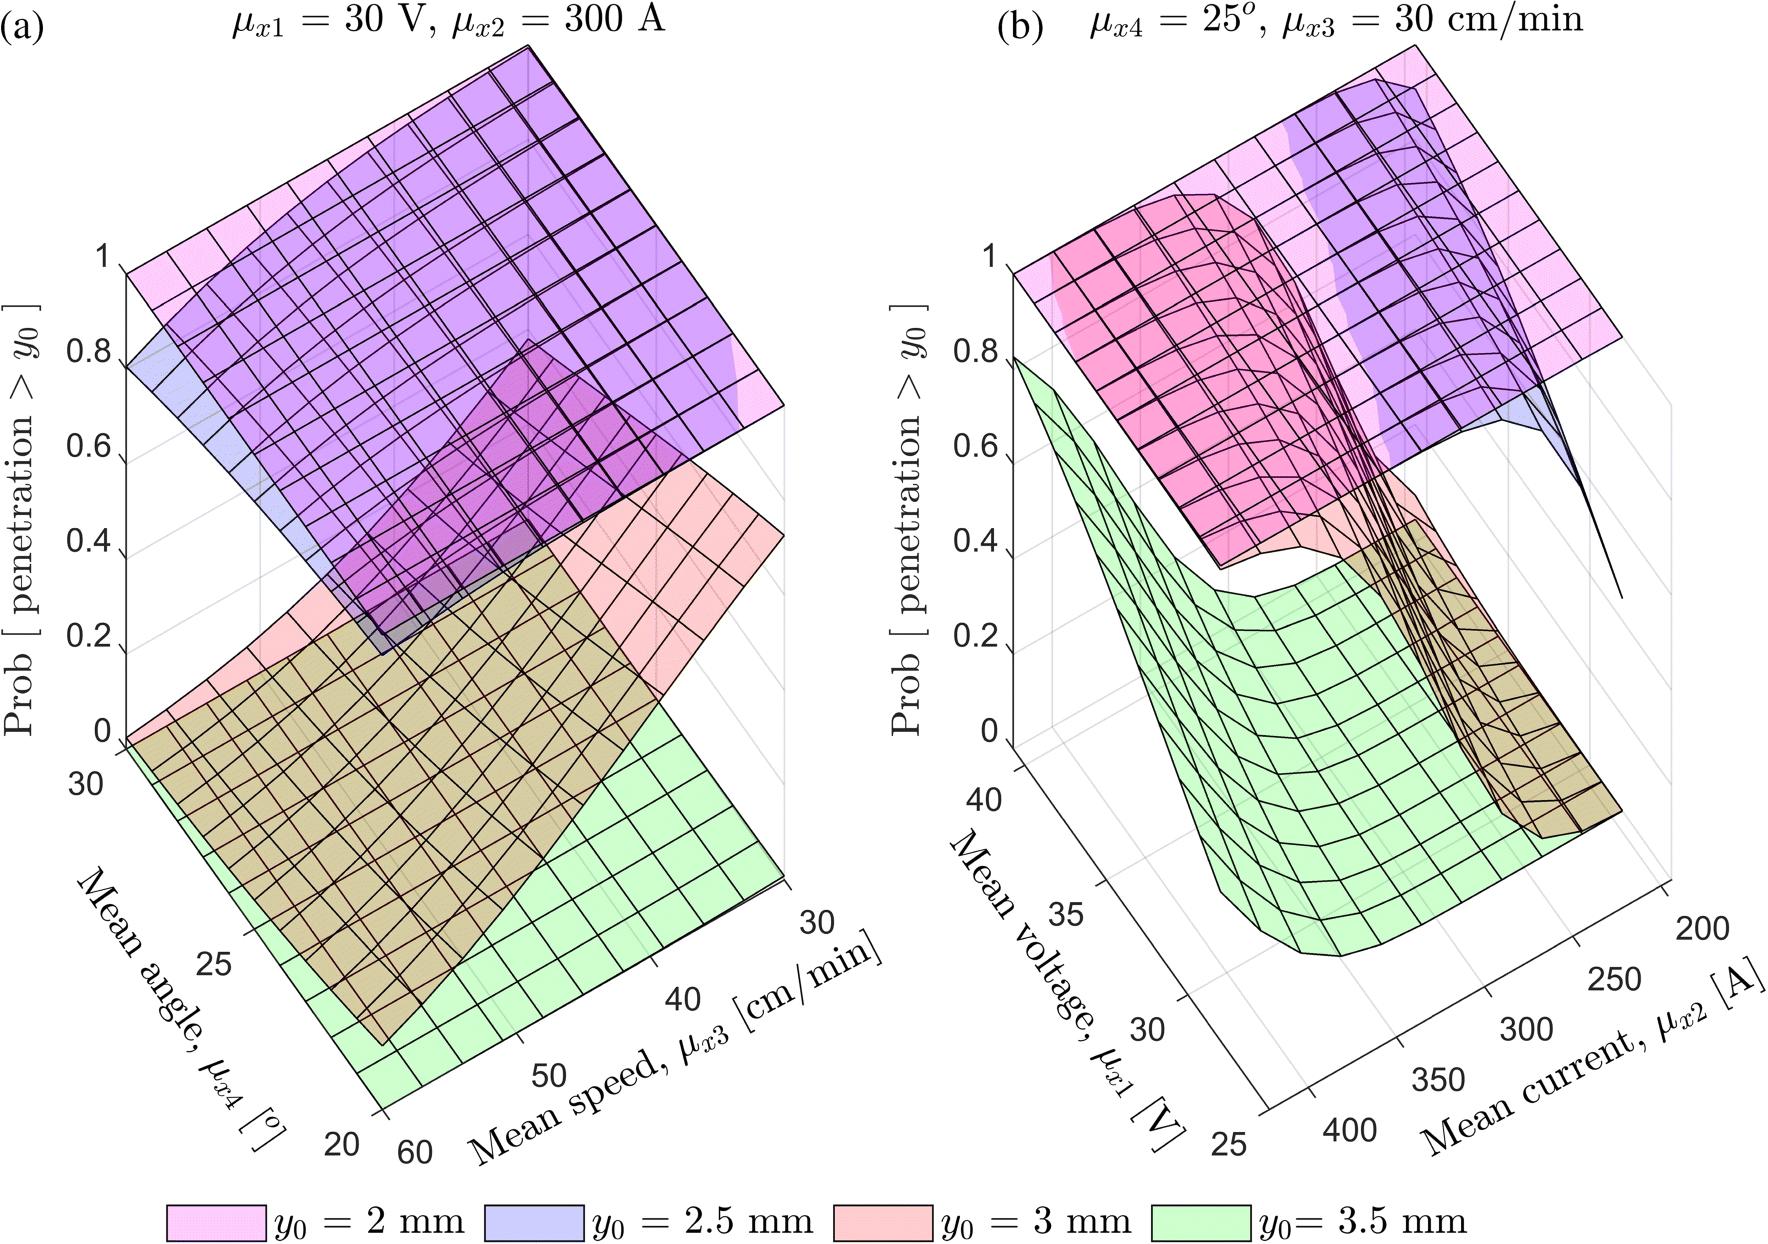 A probabilistic model of weld penetration depth based on